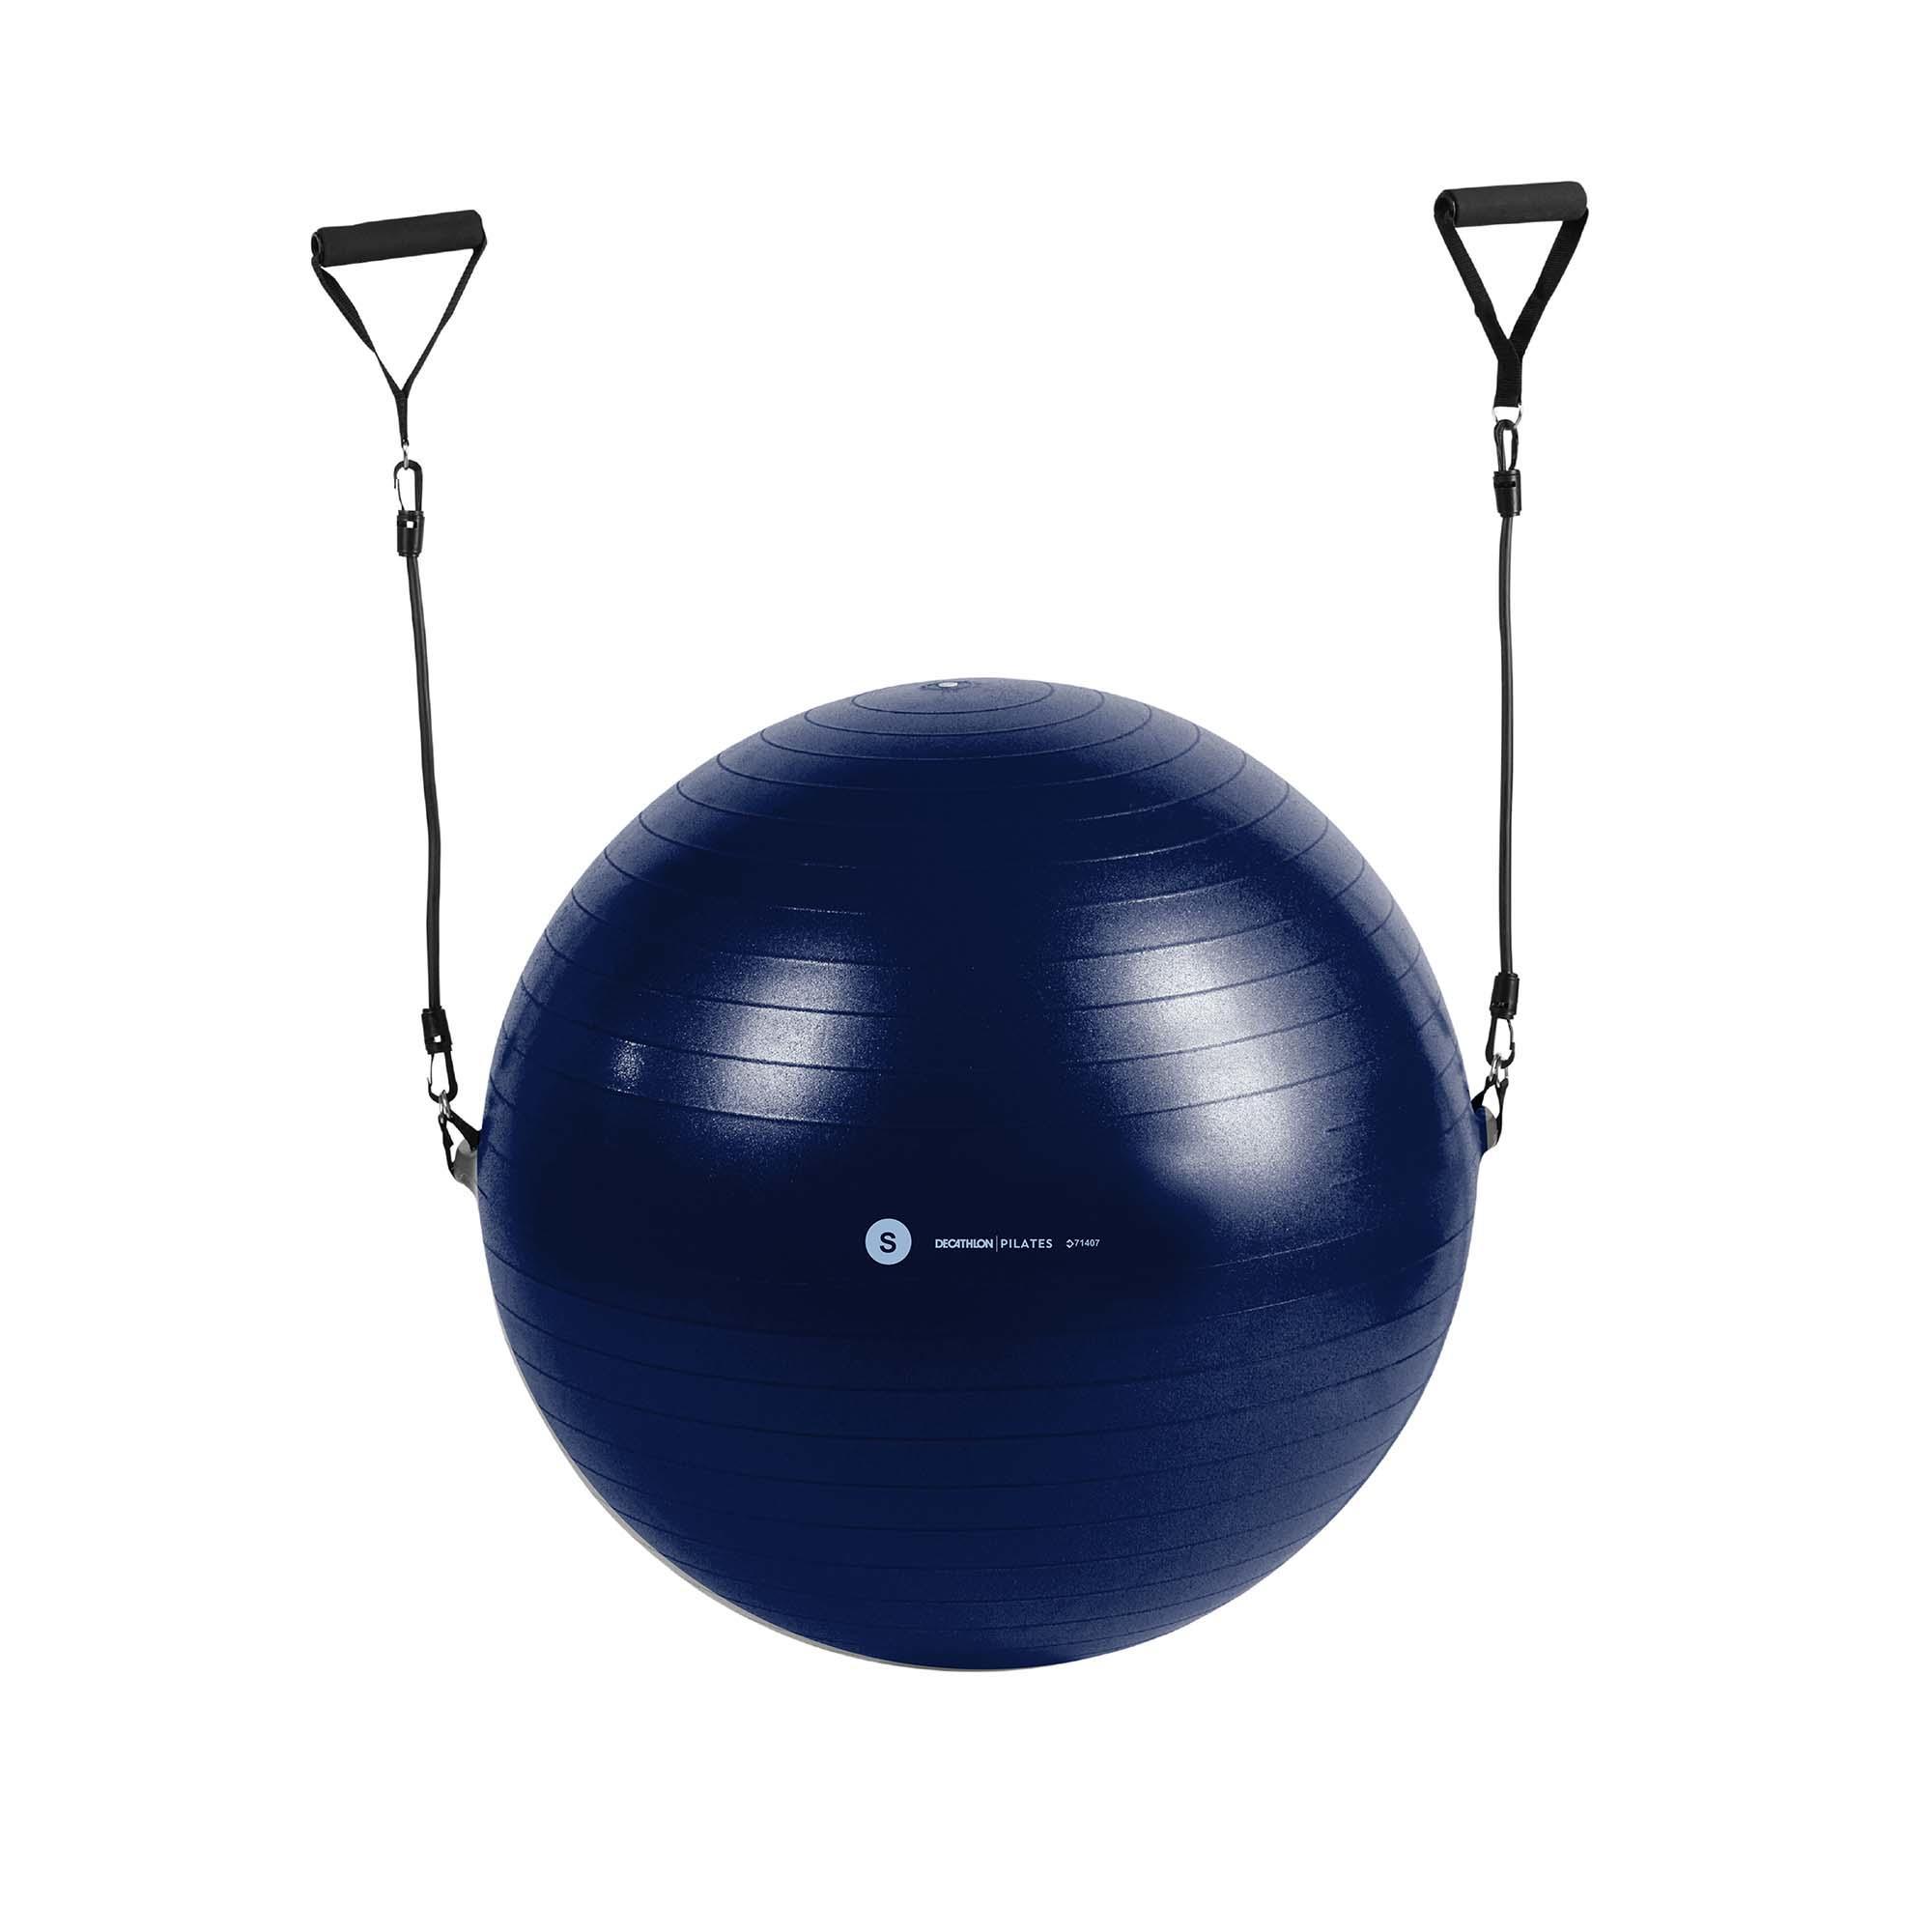 Comprar Fitball y Pelotas de Pilates Online  4fdaf62bc316